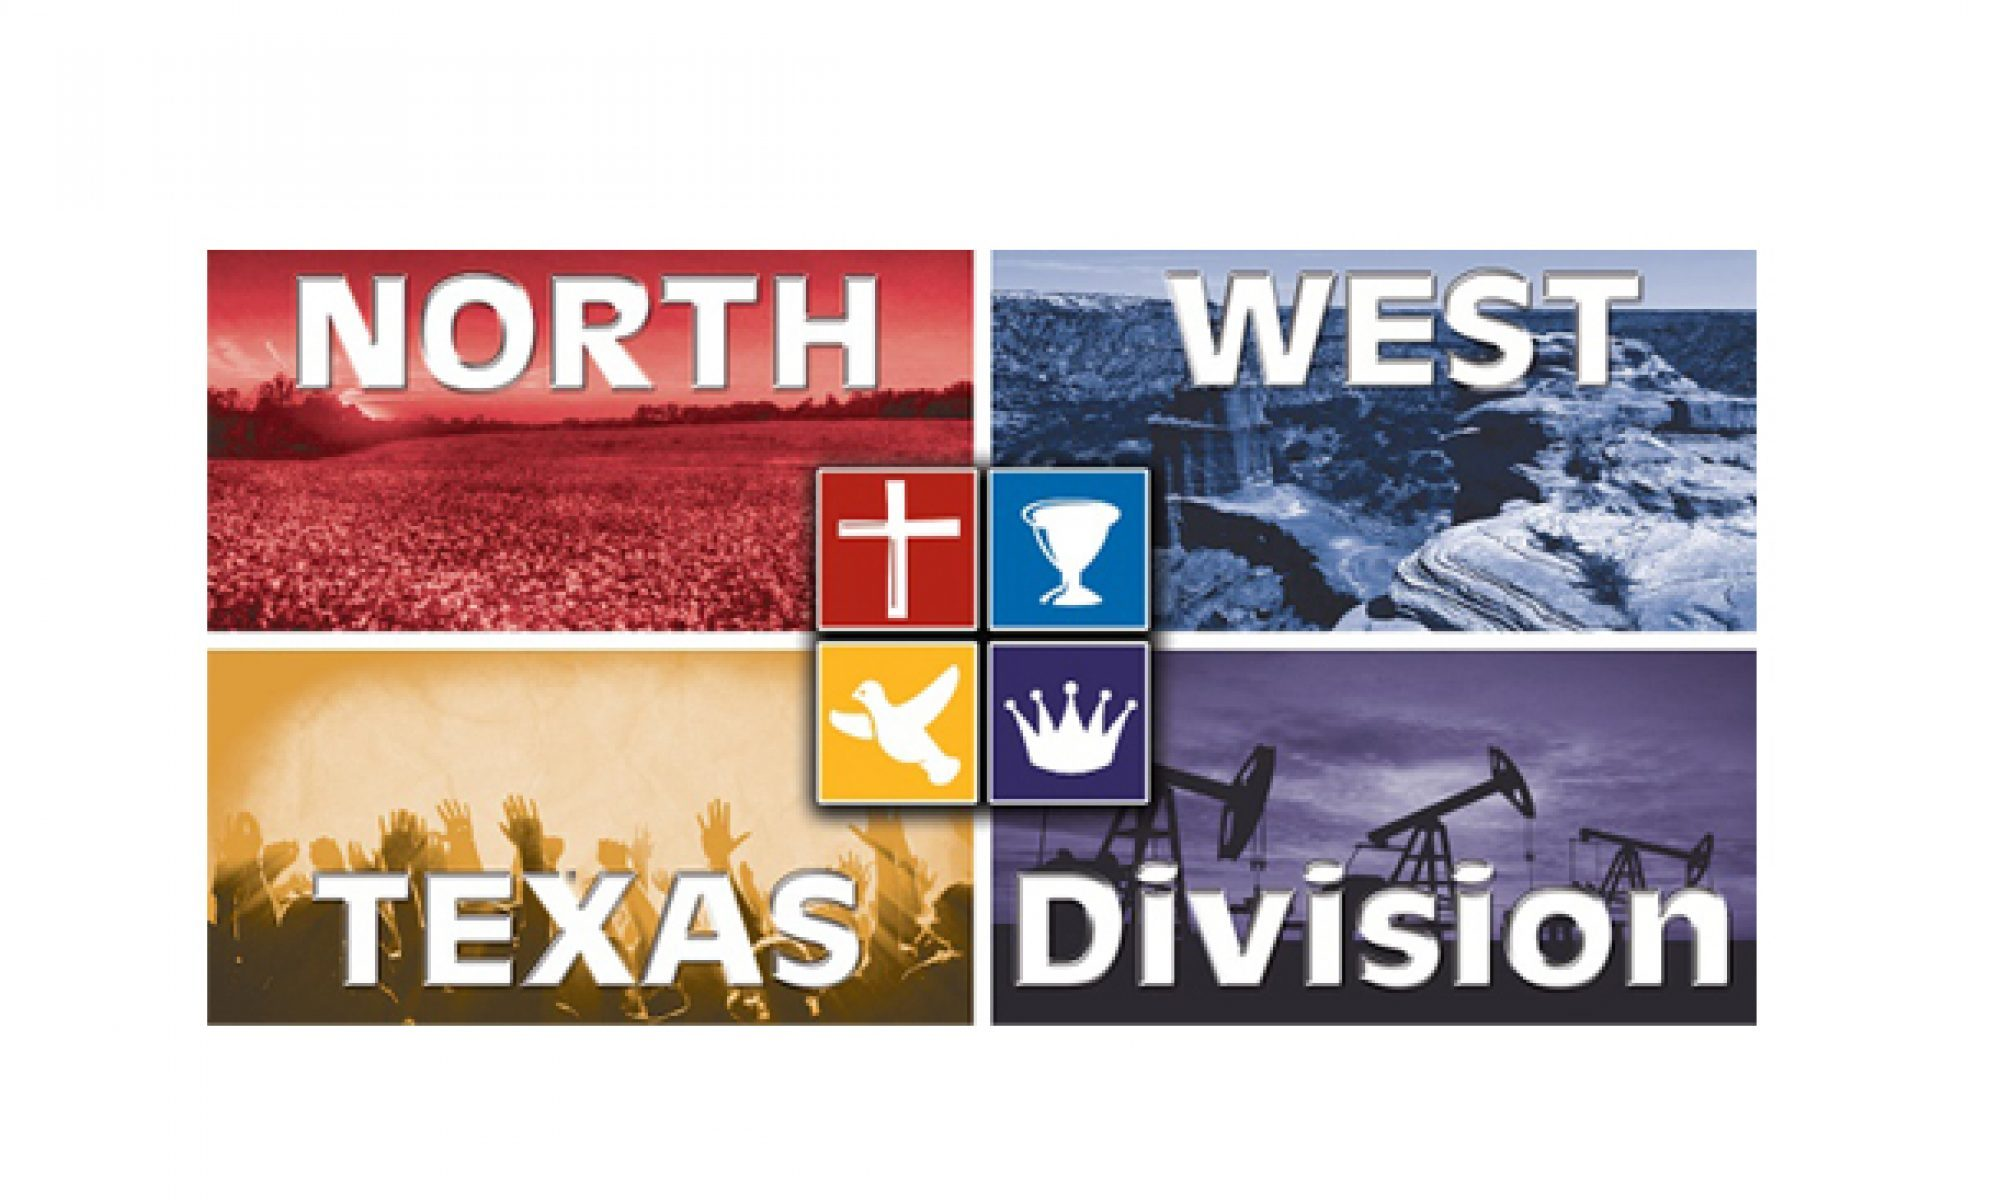 NW TX FOURSQUARE DIVISION